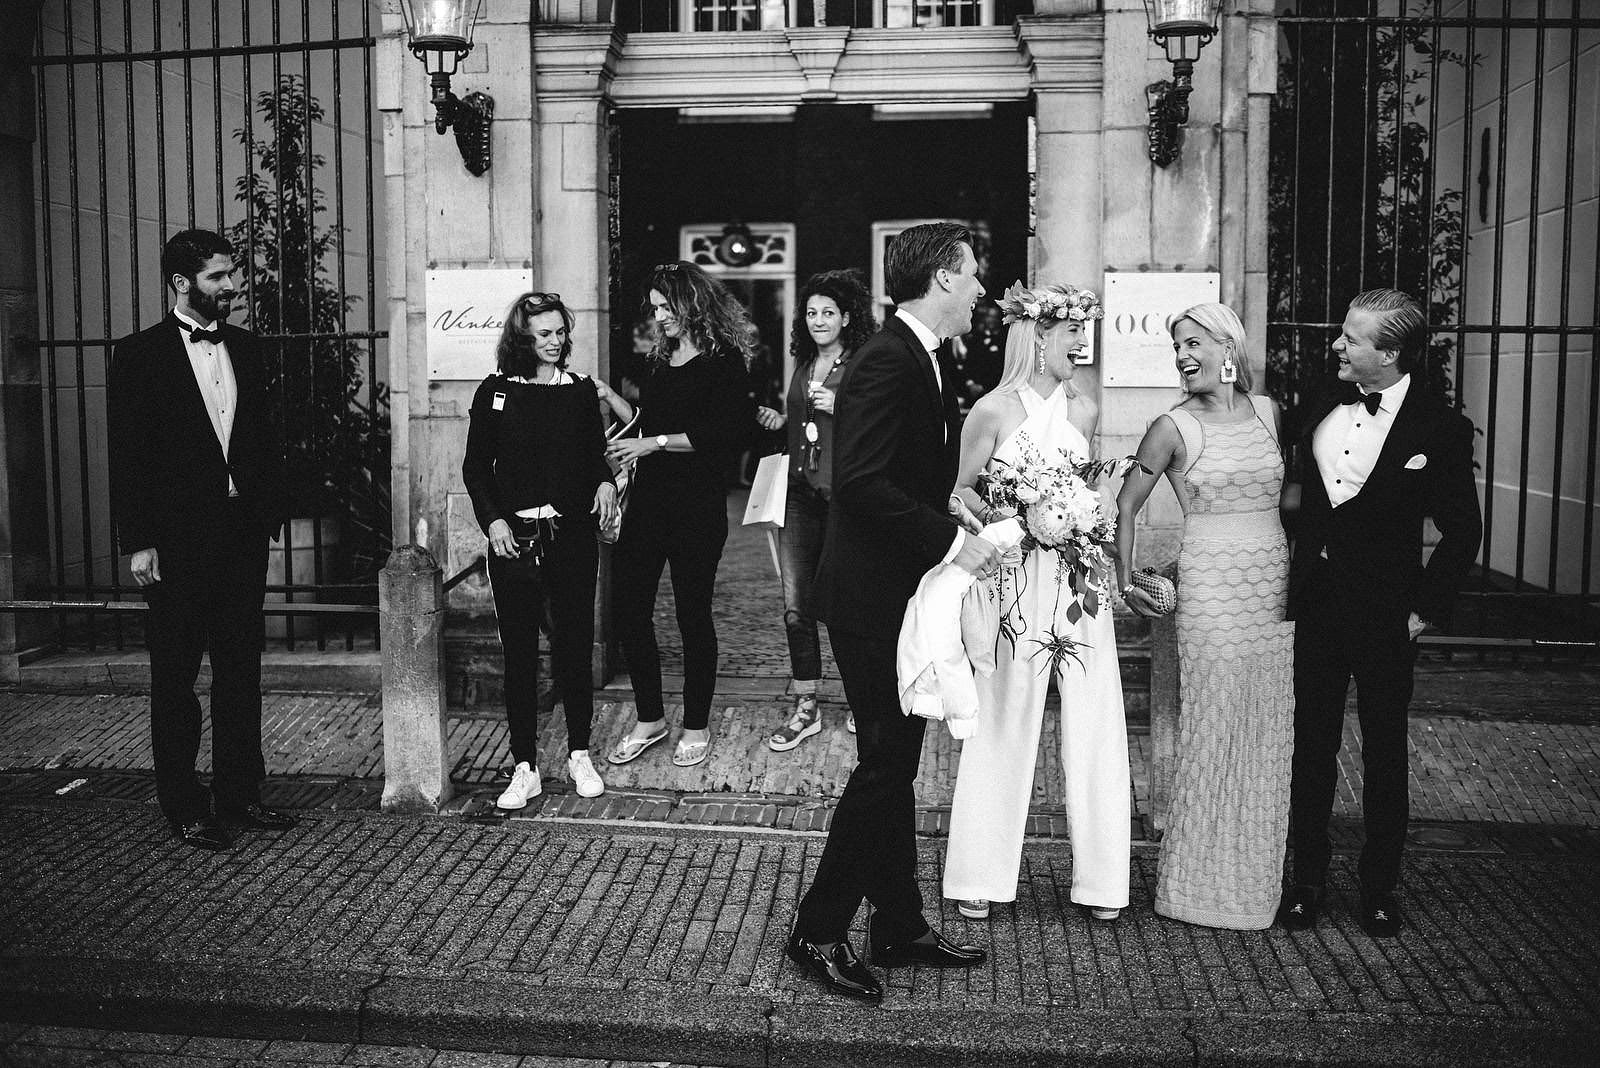 Fotograf Konstanz - Destination Wedding Photographer Amsterdam 090 - Destination Wedding Amsterdam  - 195 -